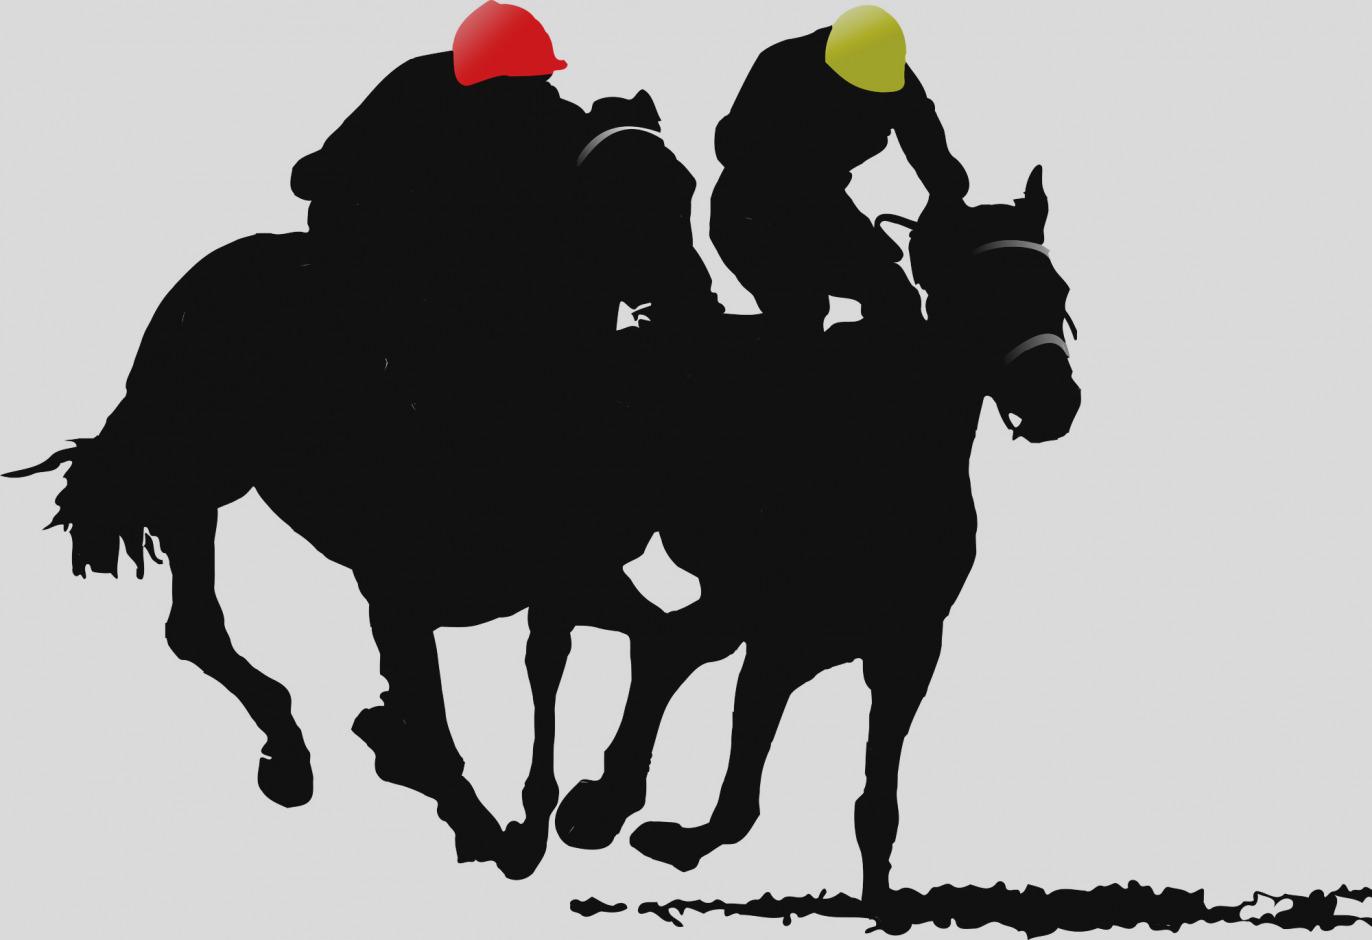 2016 clipart kentucky derby. New clip art party